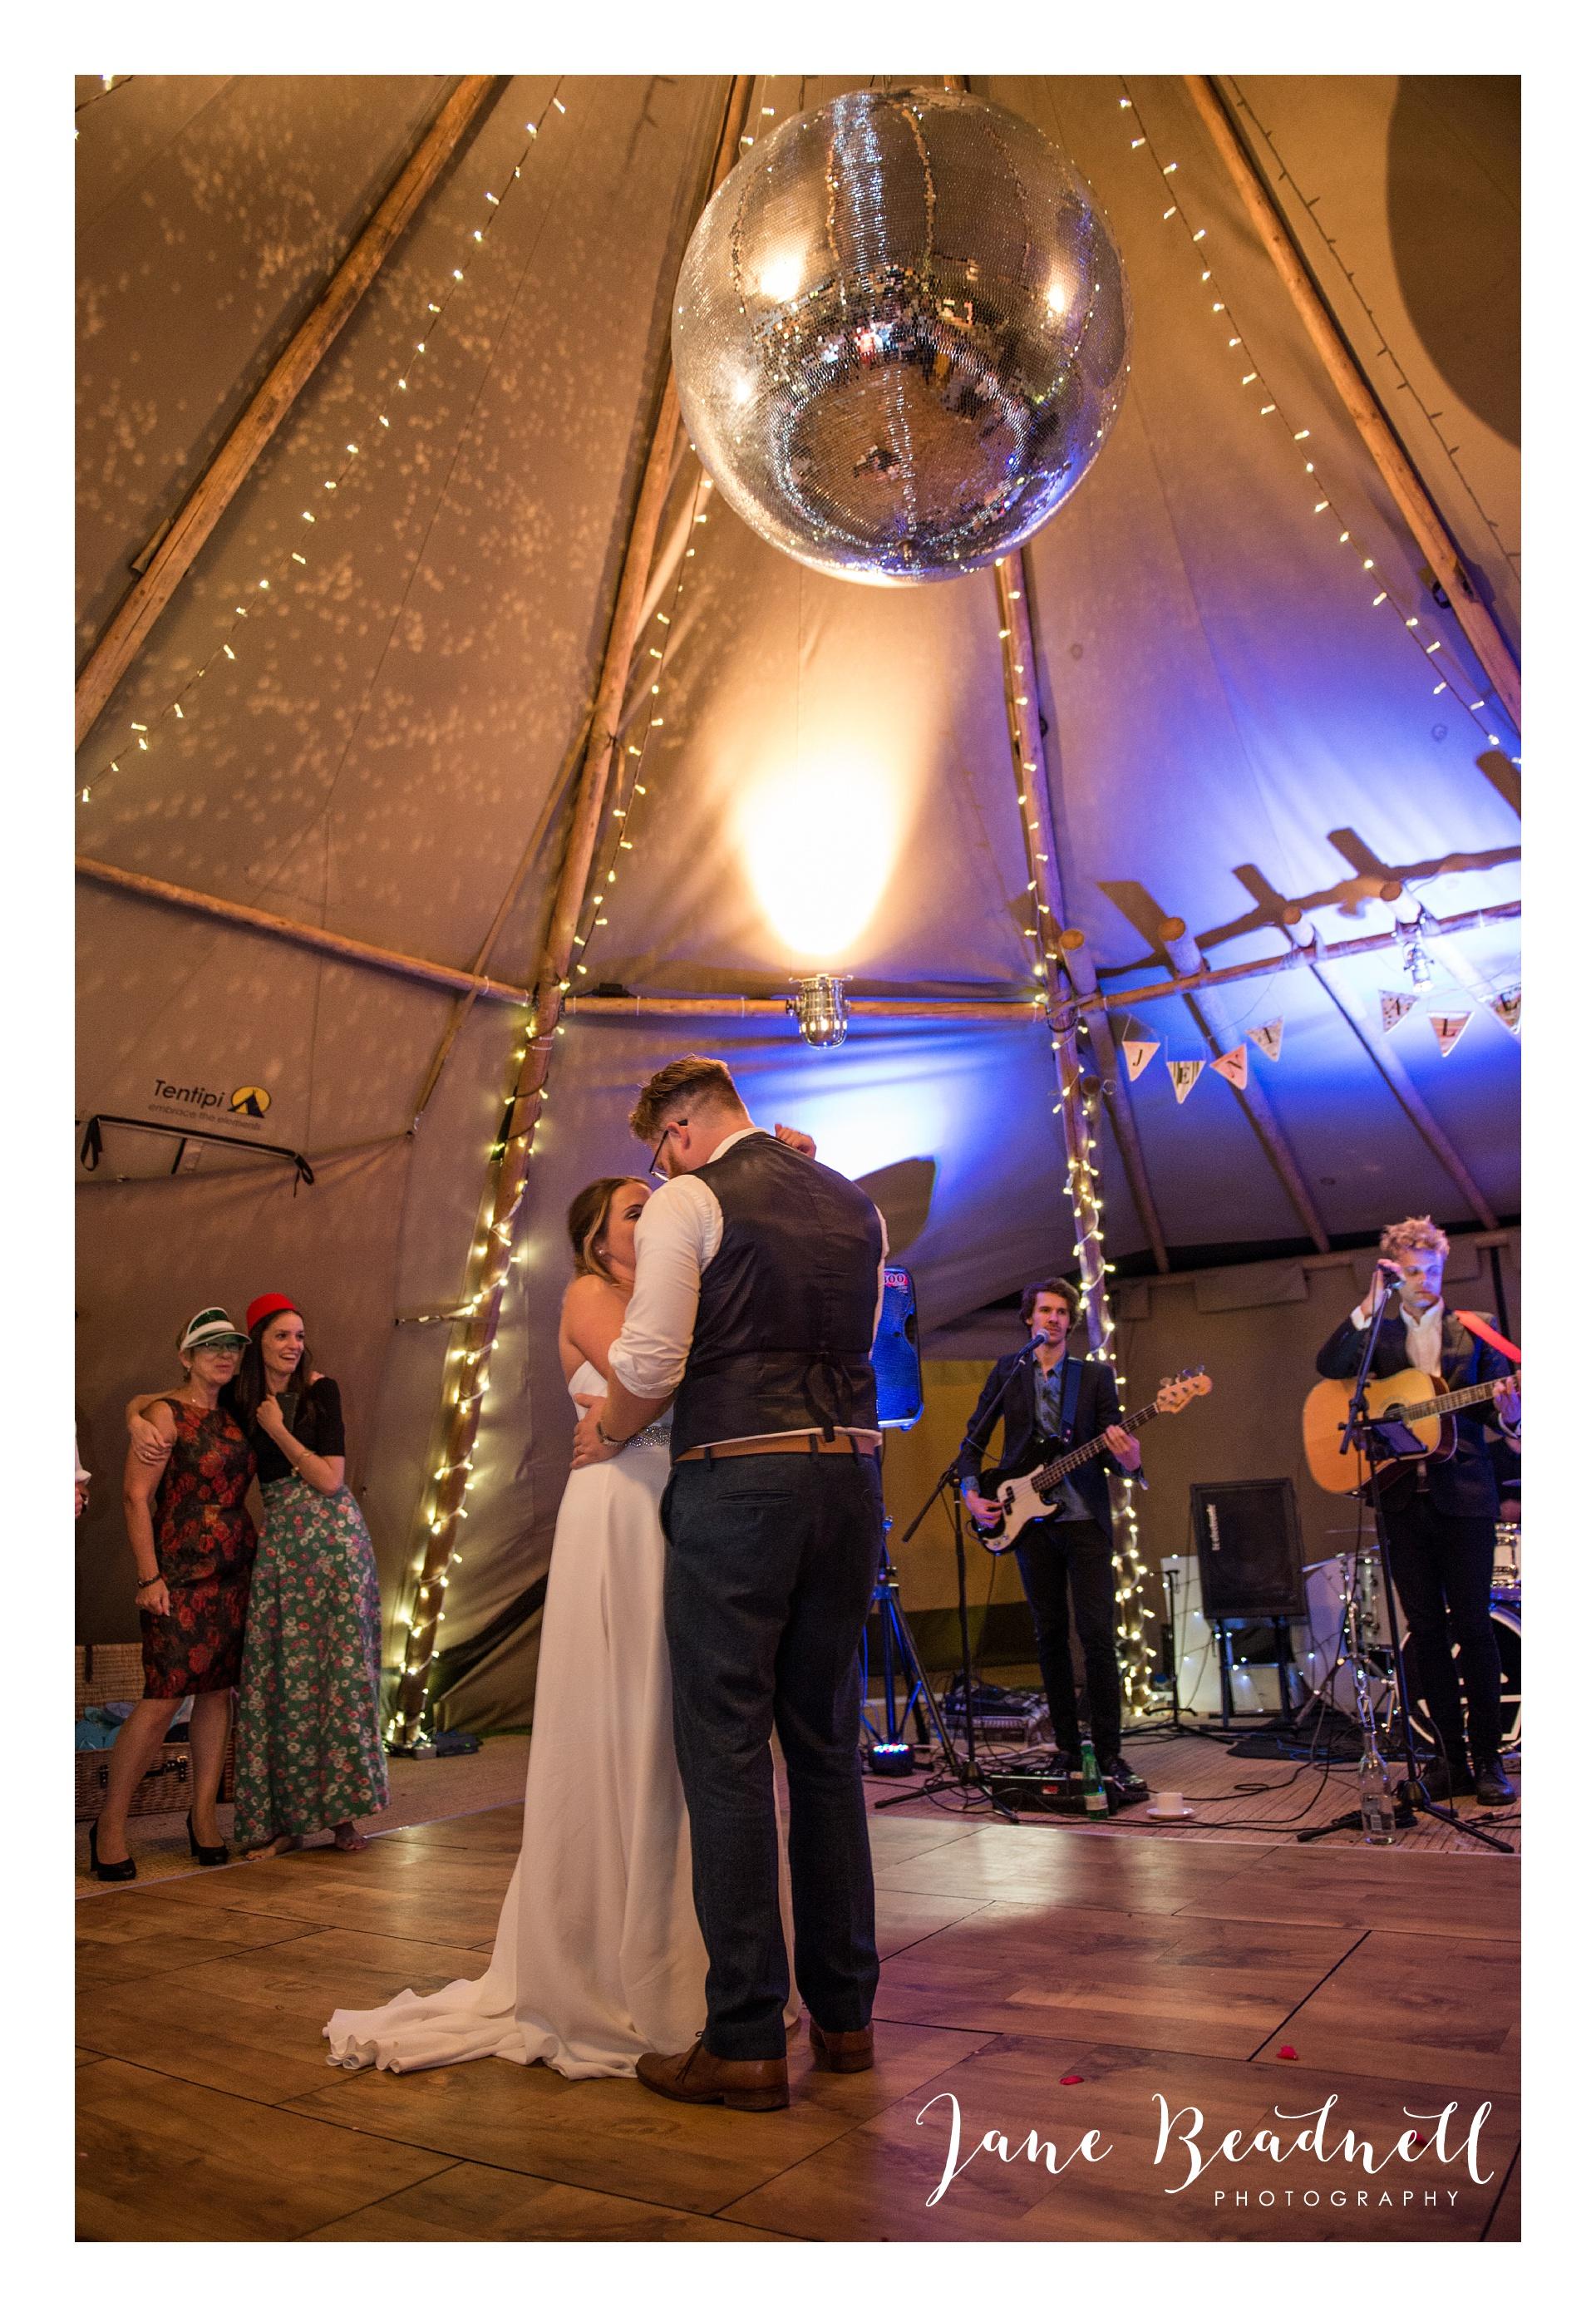 fine-art-wedding-photographer-jane-beadnell-yorkshire-wedding-photographer_0166